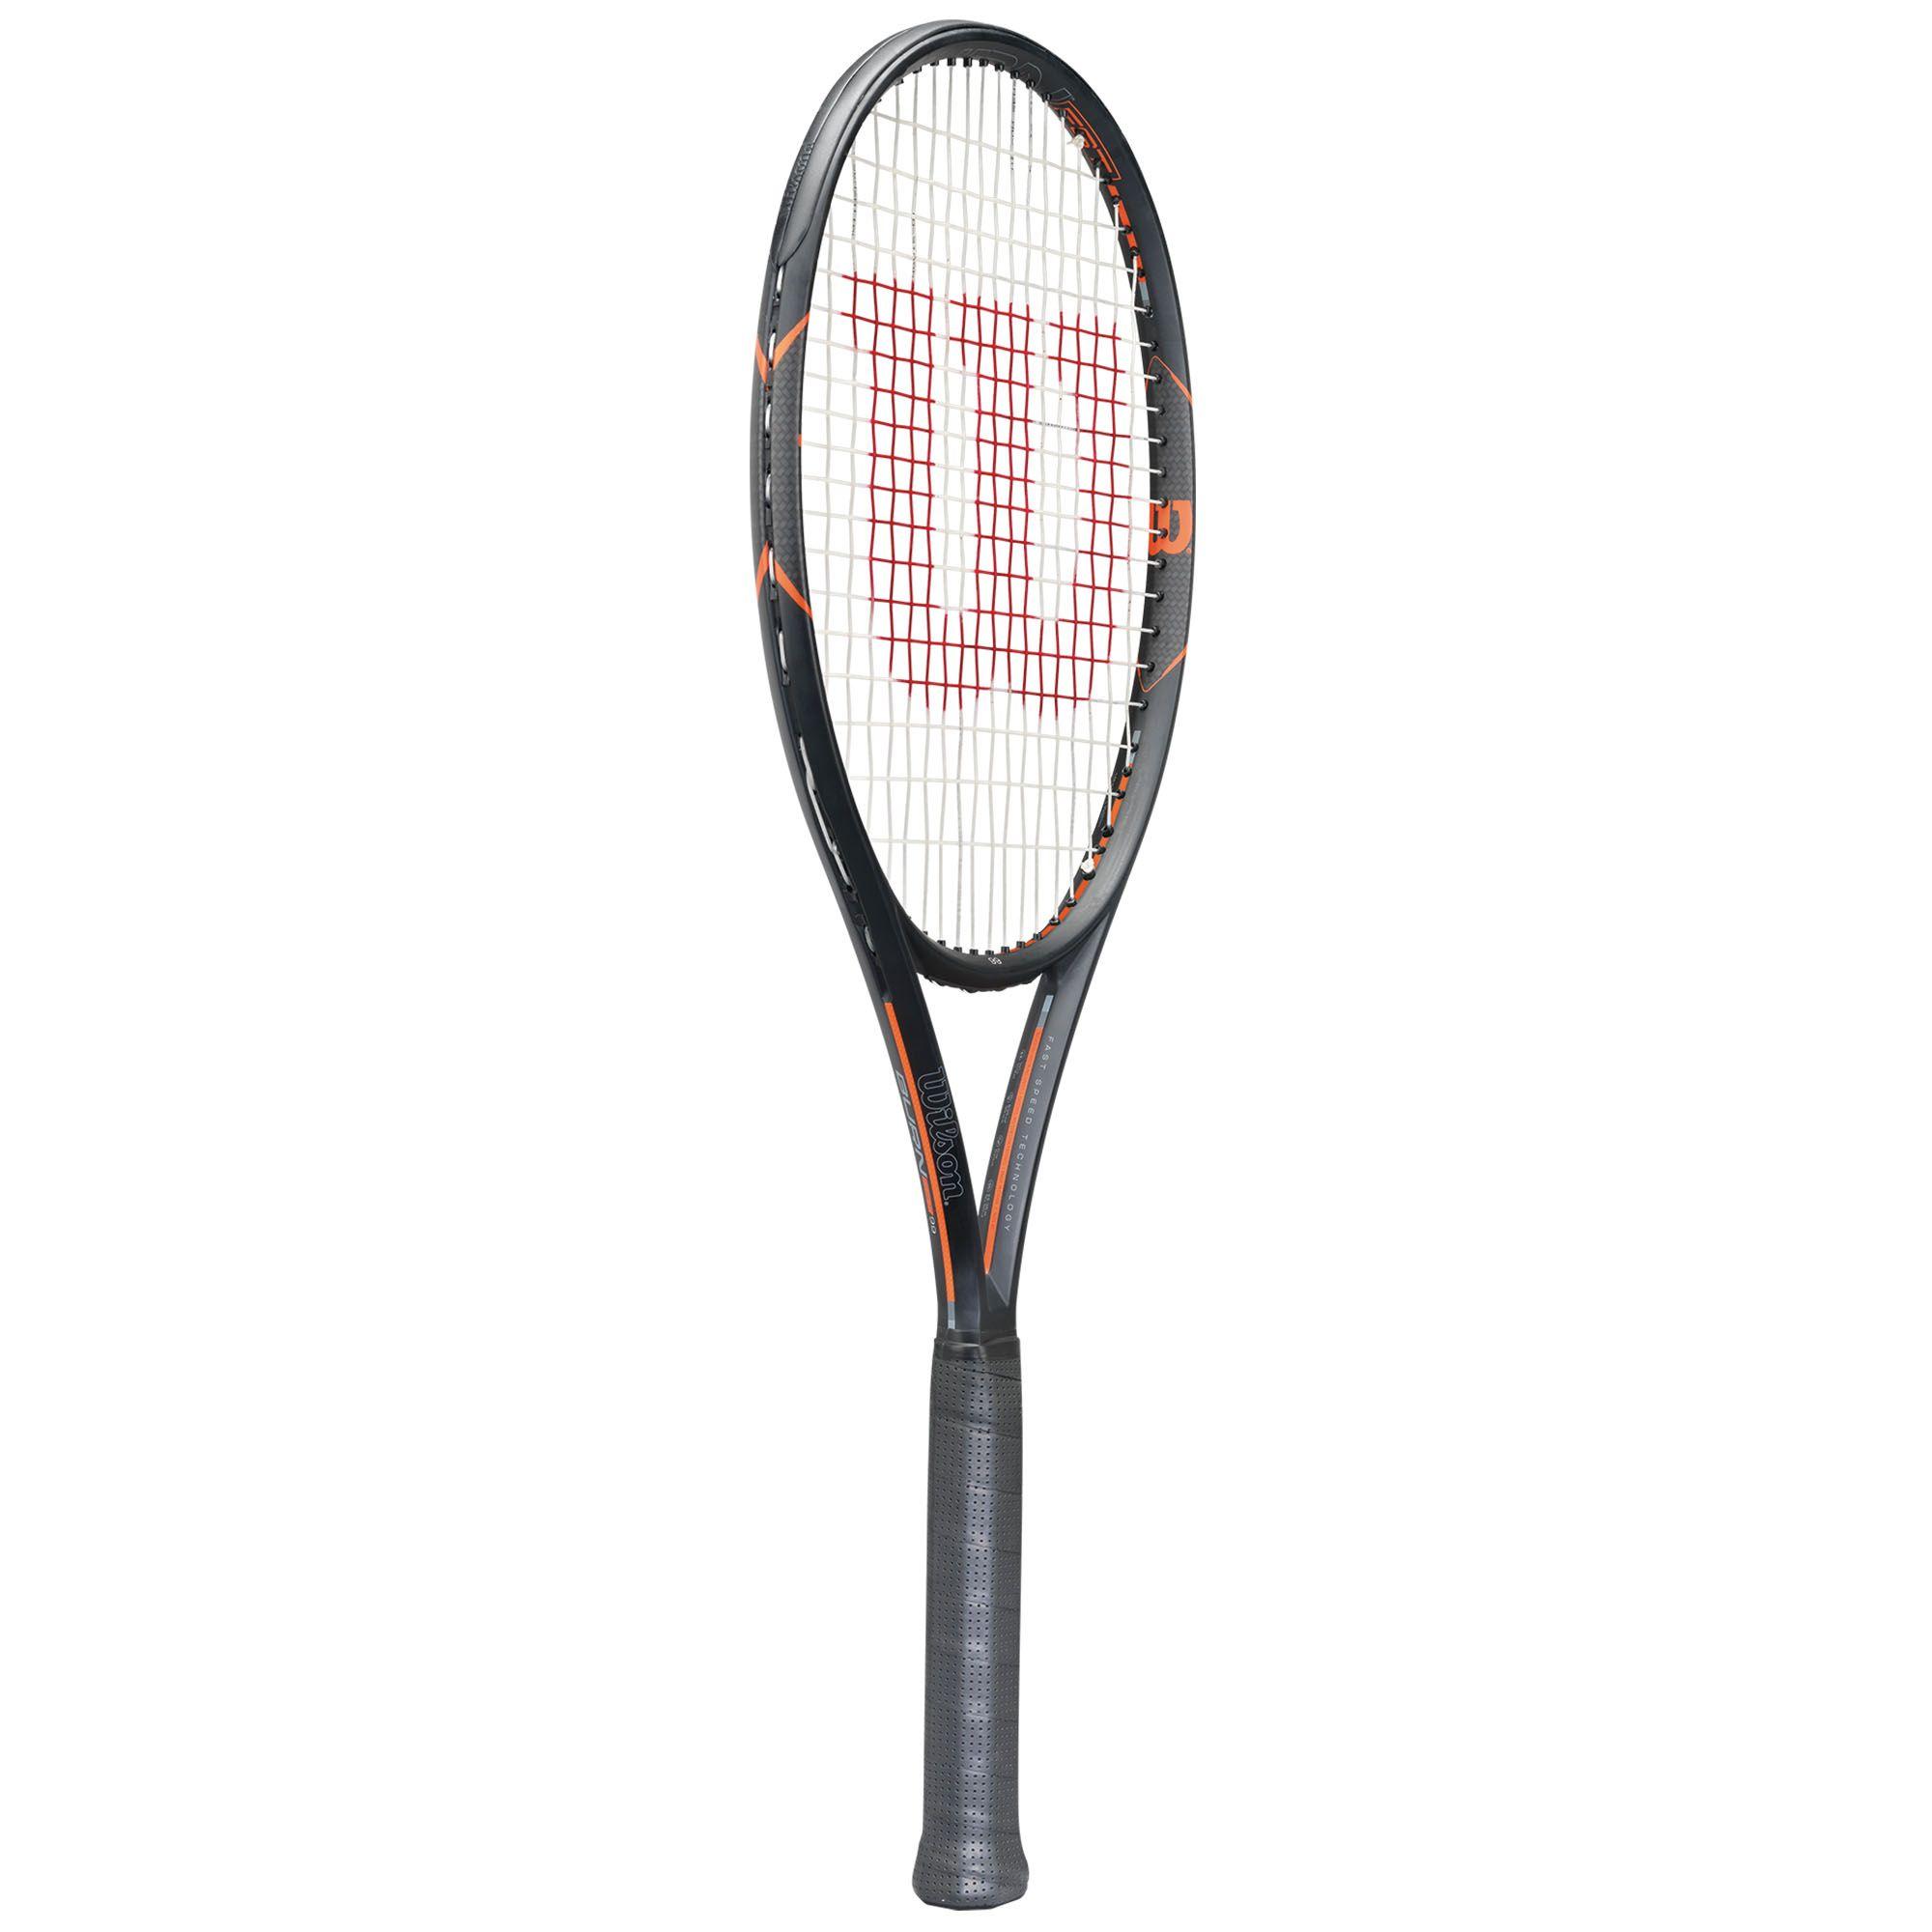 Wilson Burn Fst 99 Tennis Racket